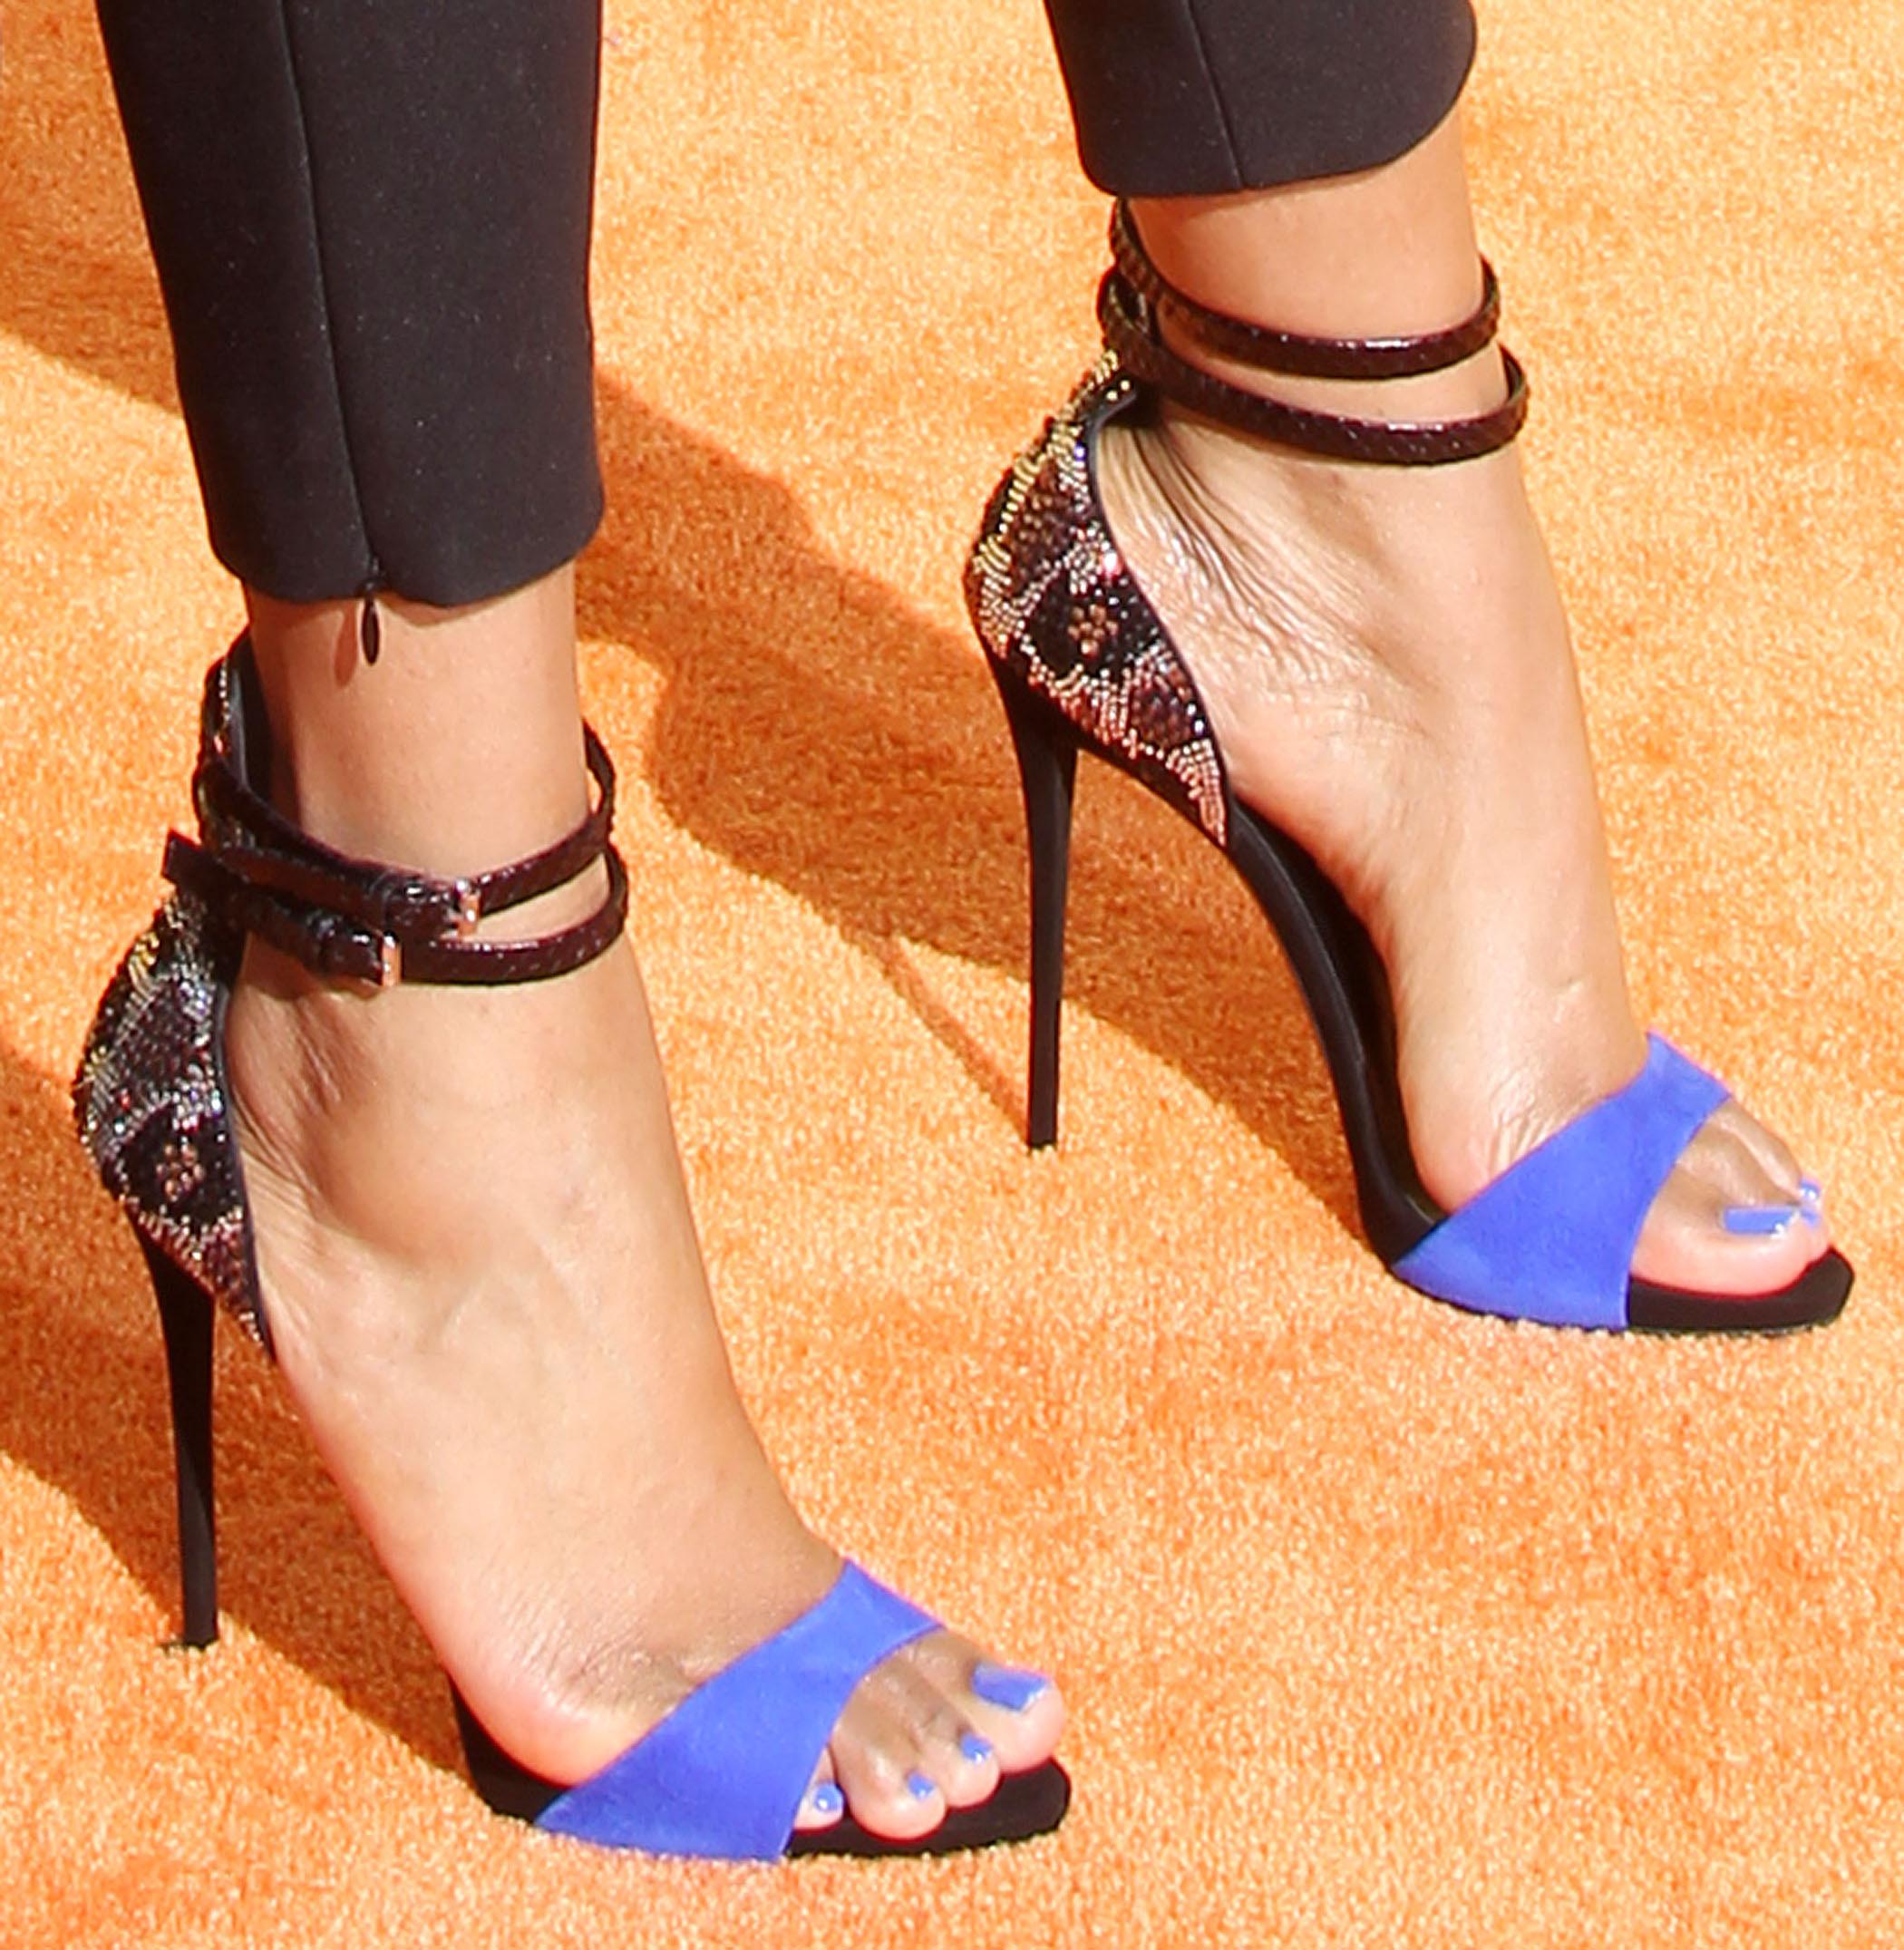 porno star beautiful feet